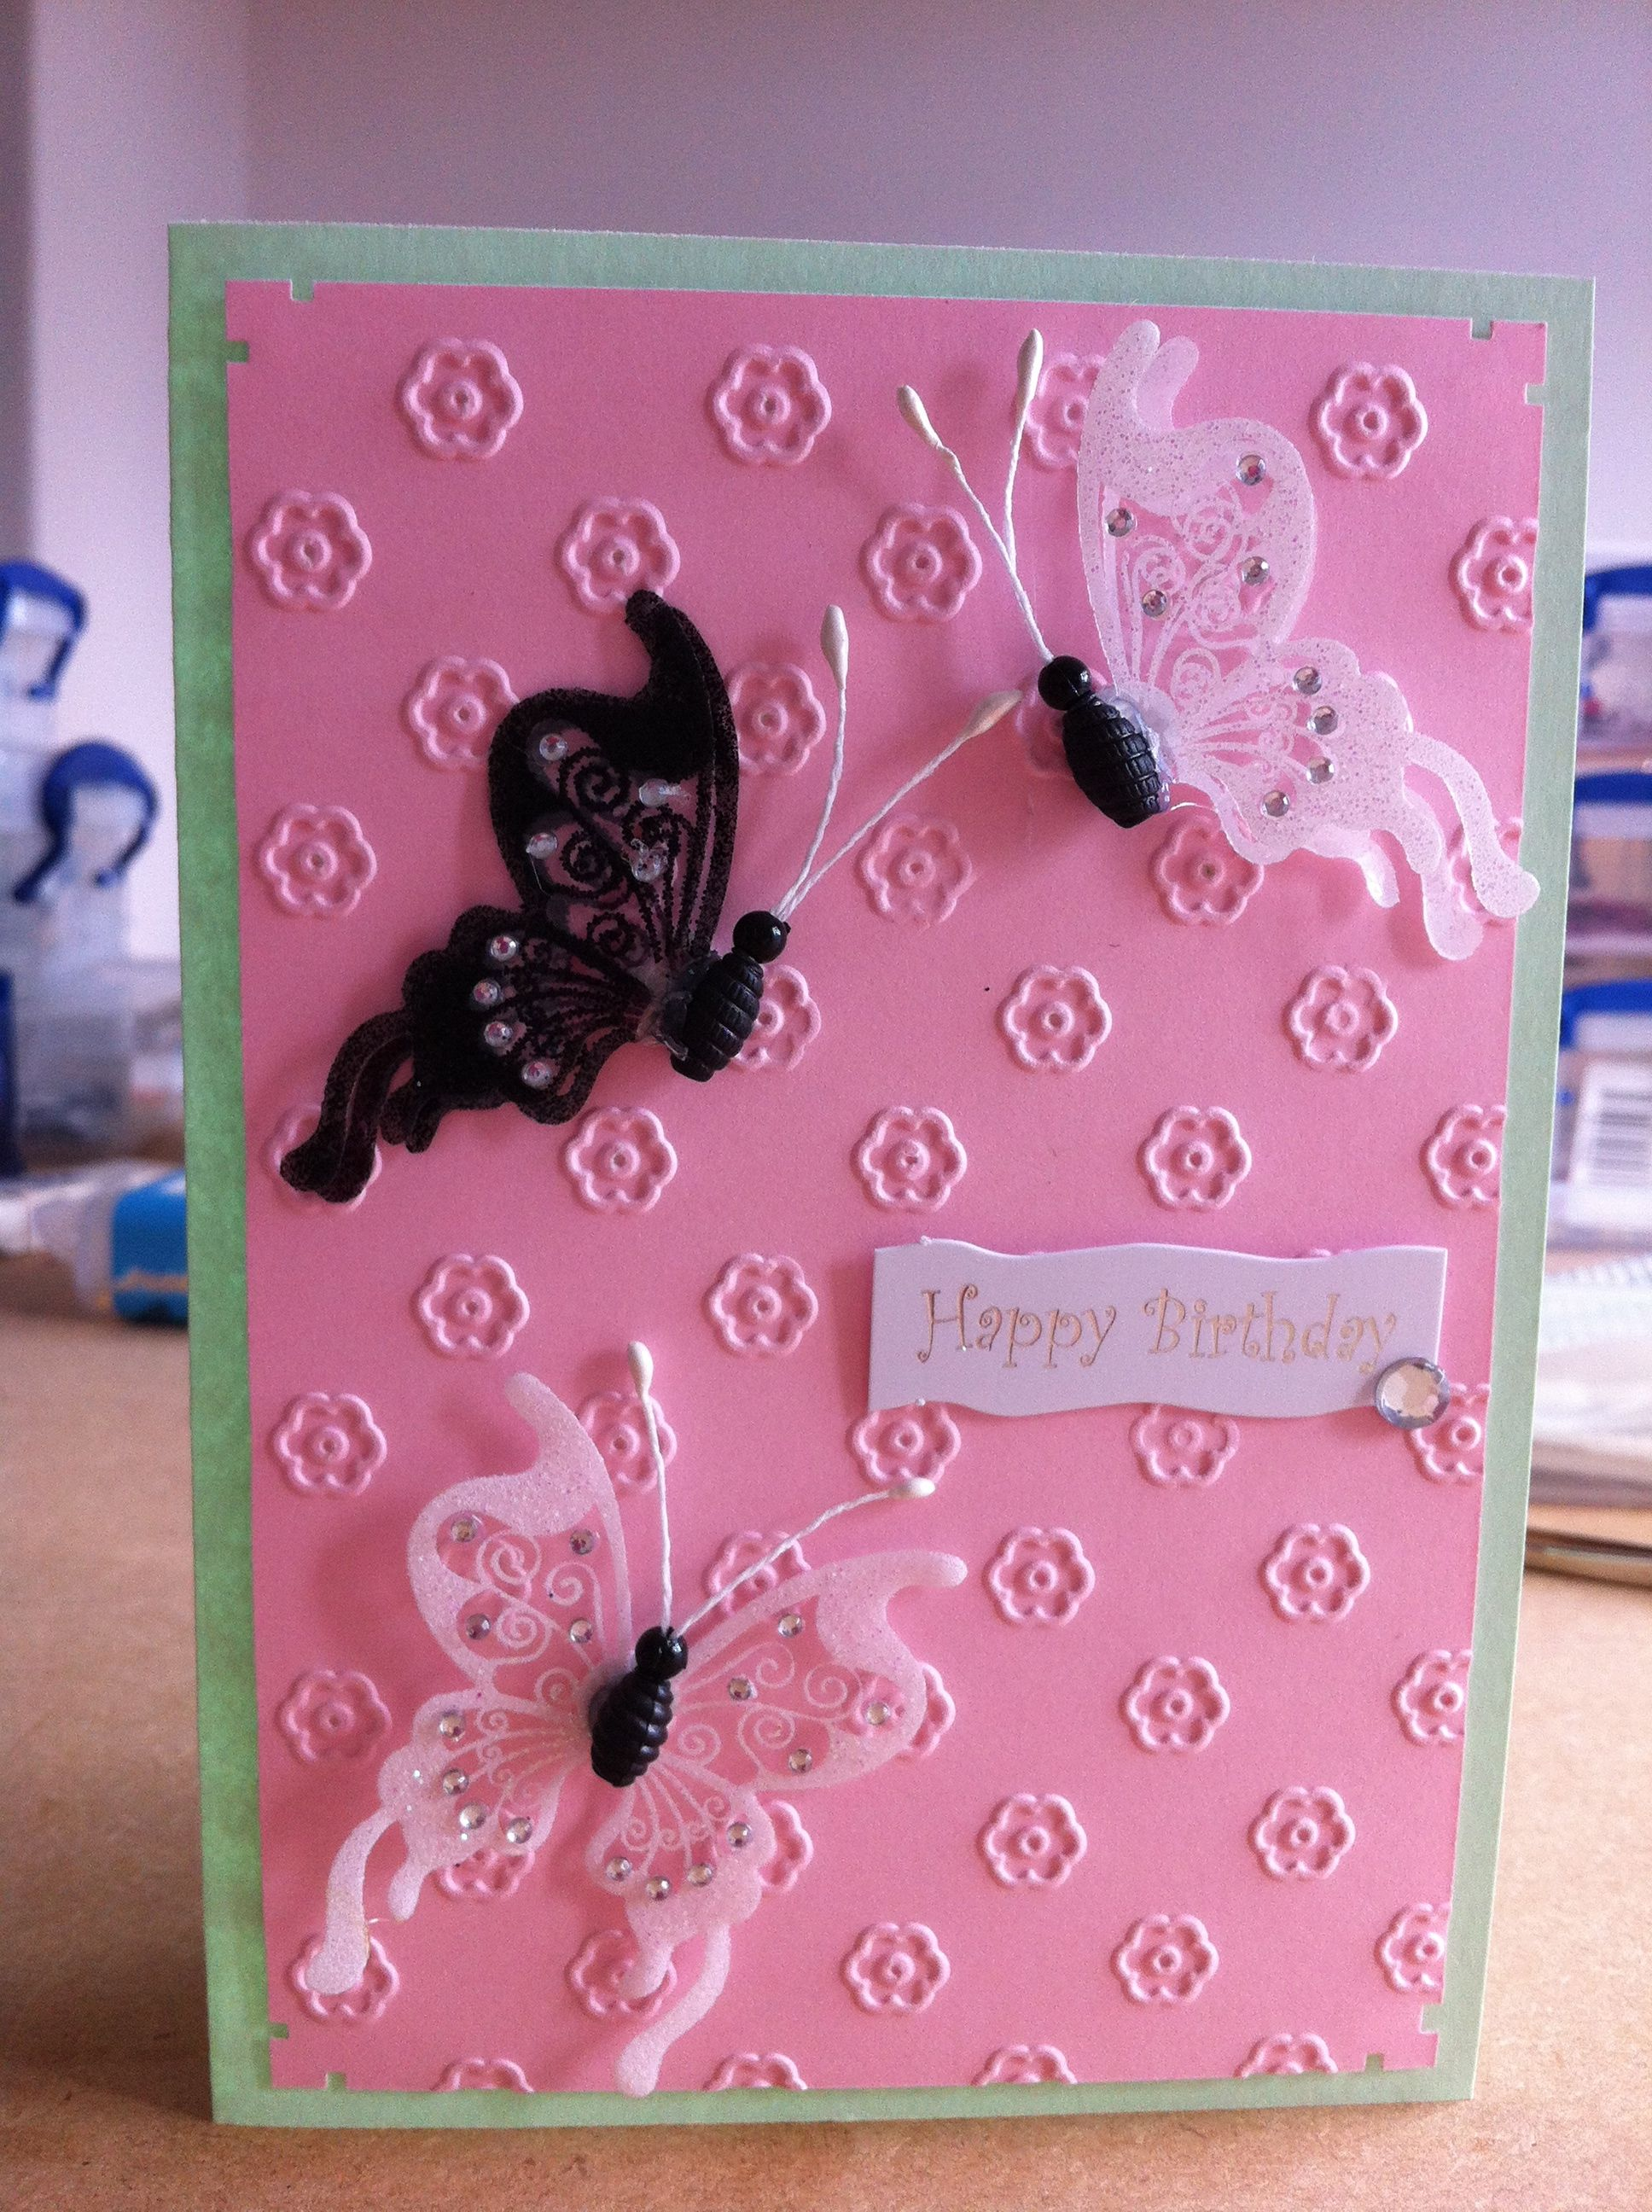 Card Making Ideas Using Cuttlebug Part - 27: Birthday Card - Female Using Cuttlebug Embossing Folder.